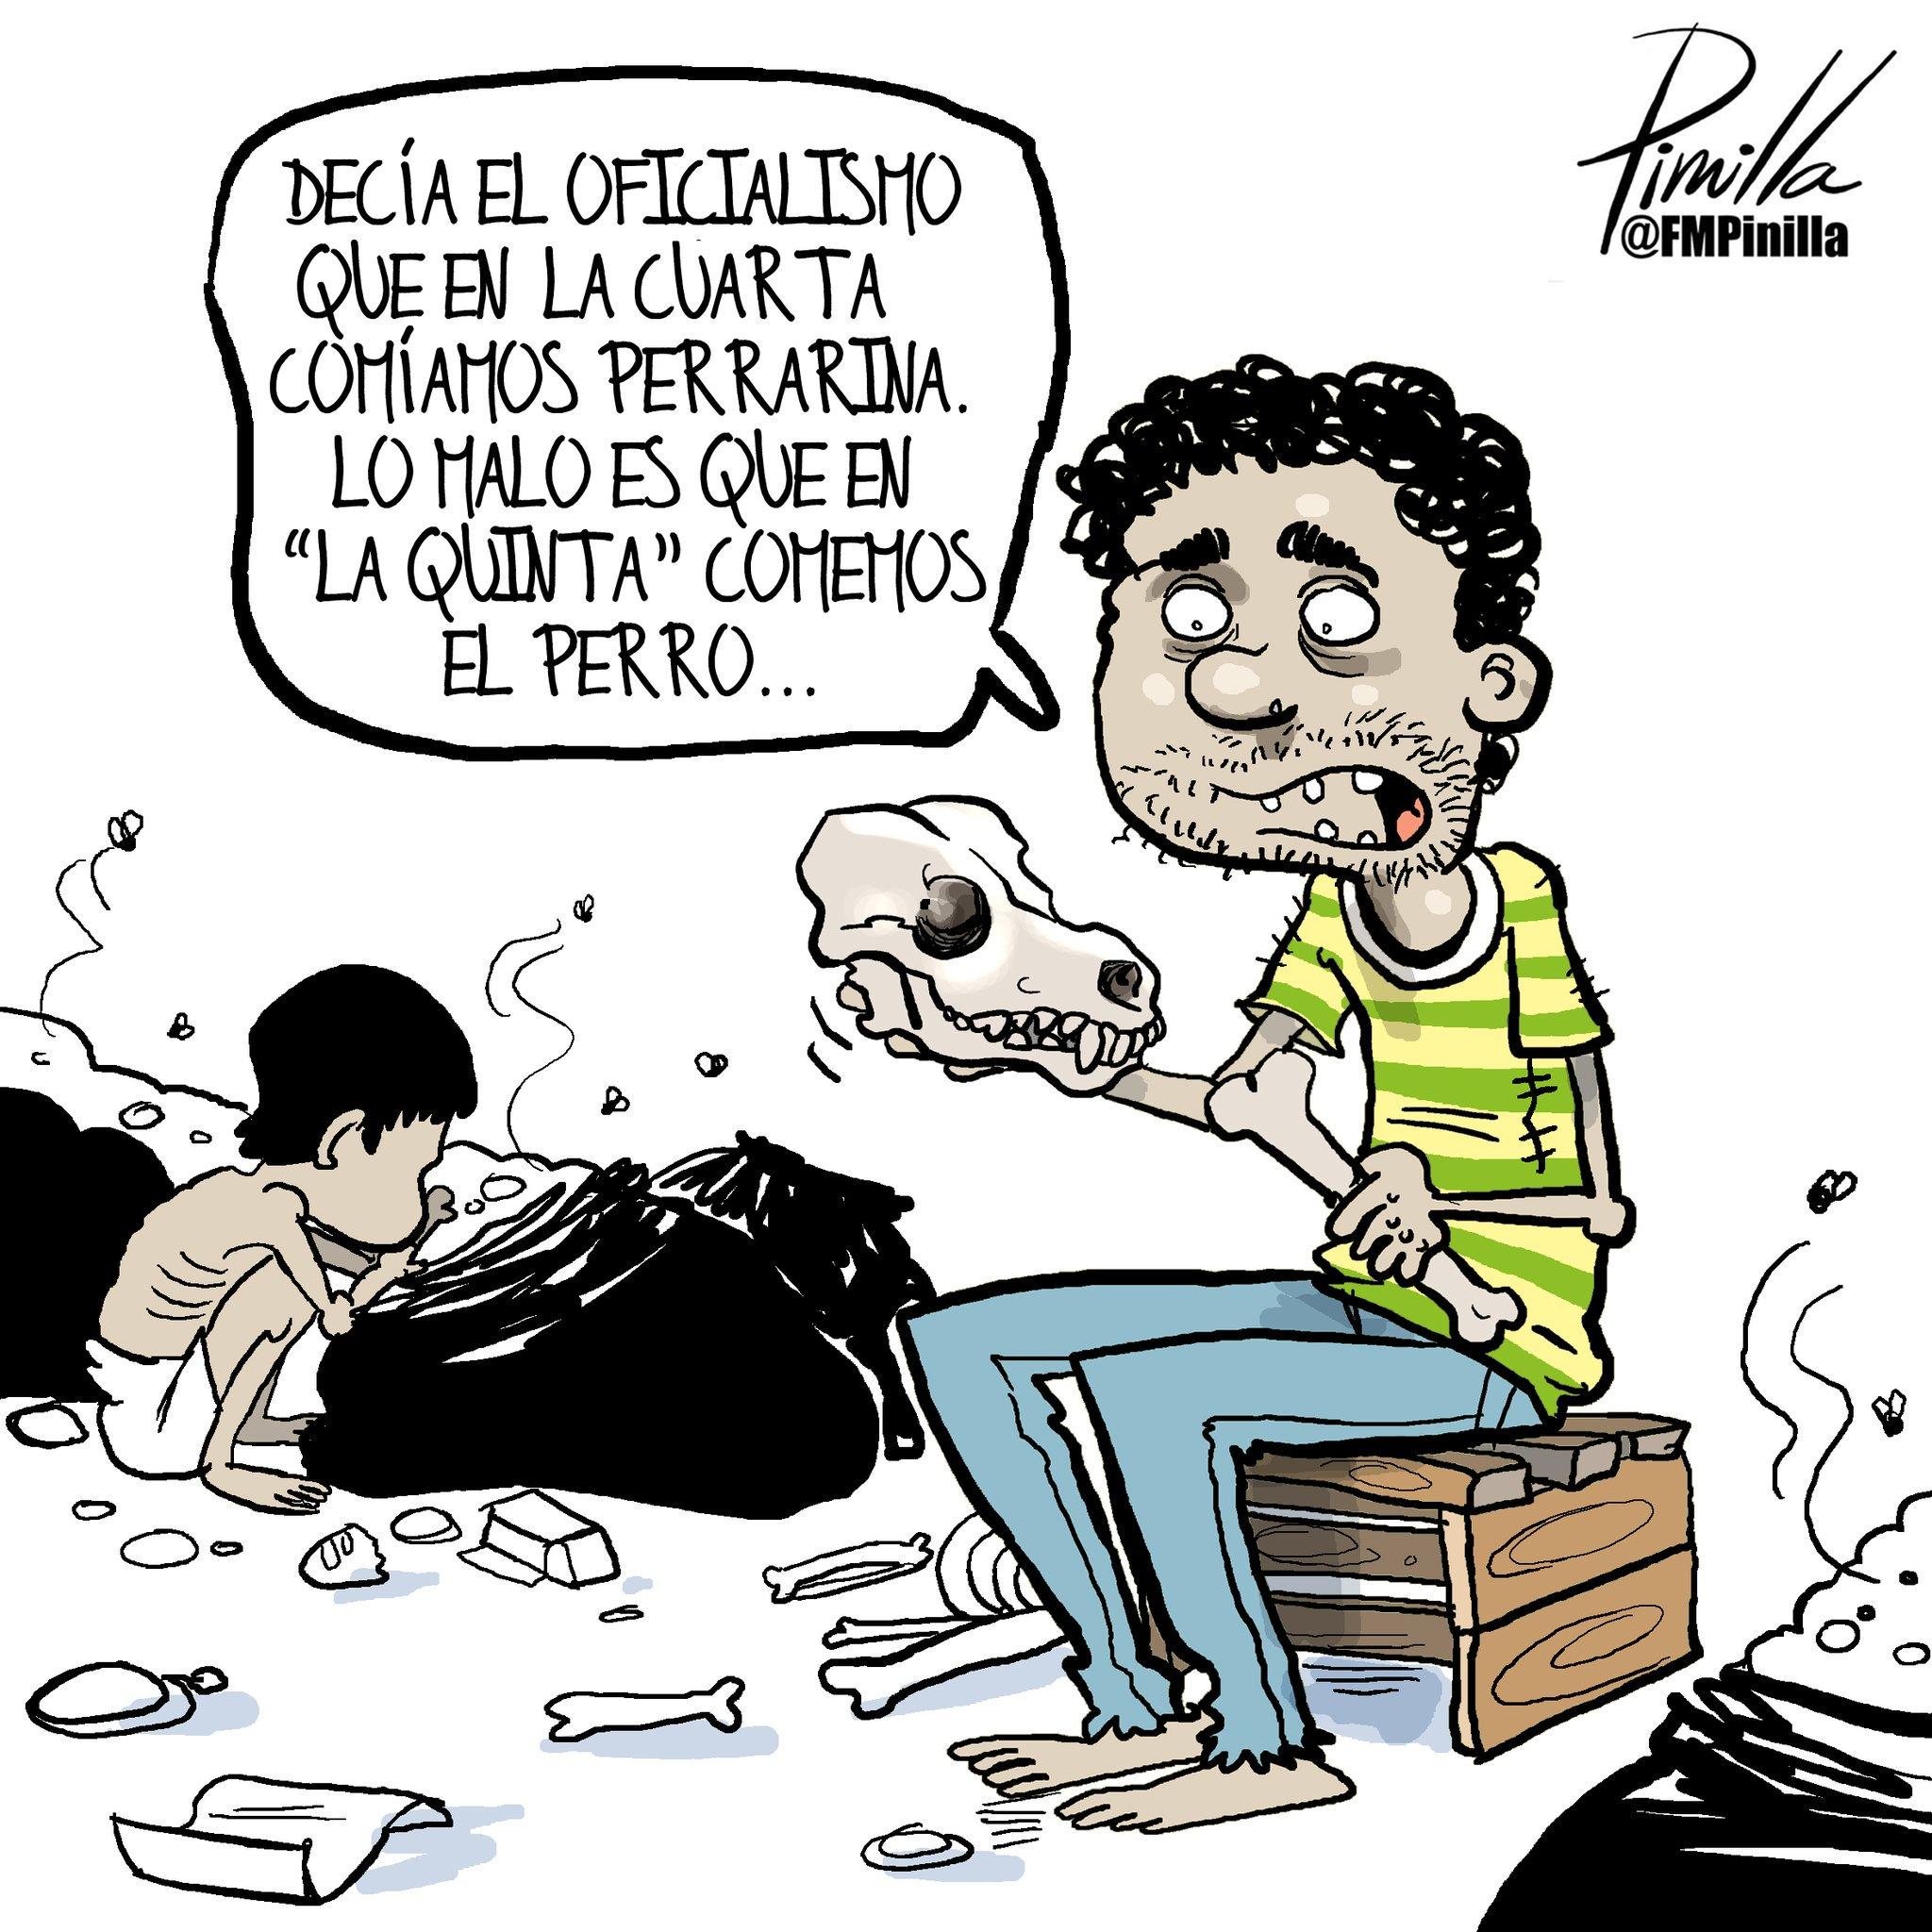 Venezuela crisis economica - Página 4 DXwi-BVXkAE3Zh6